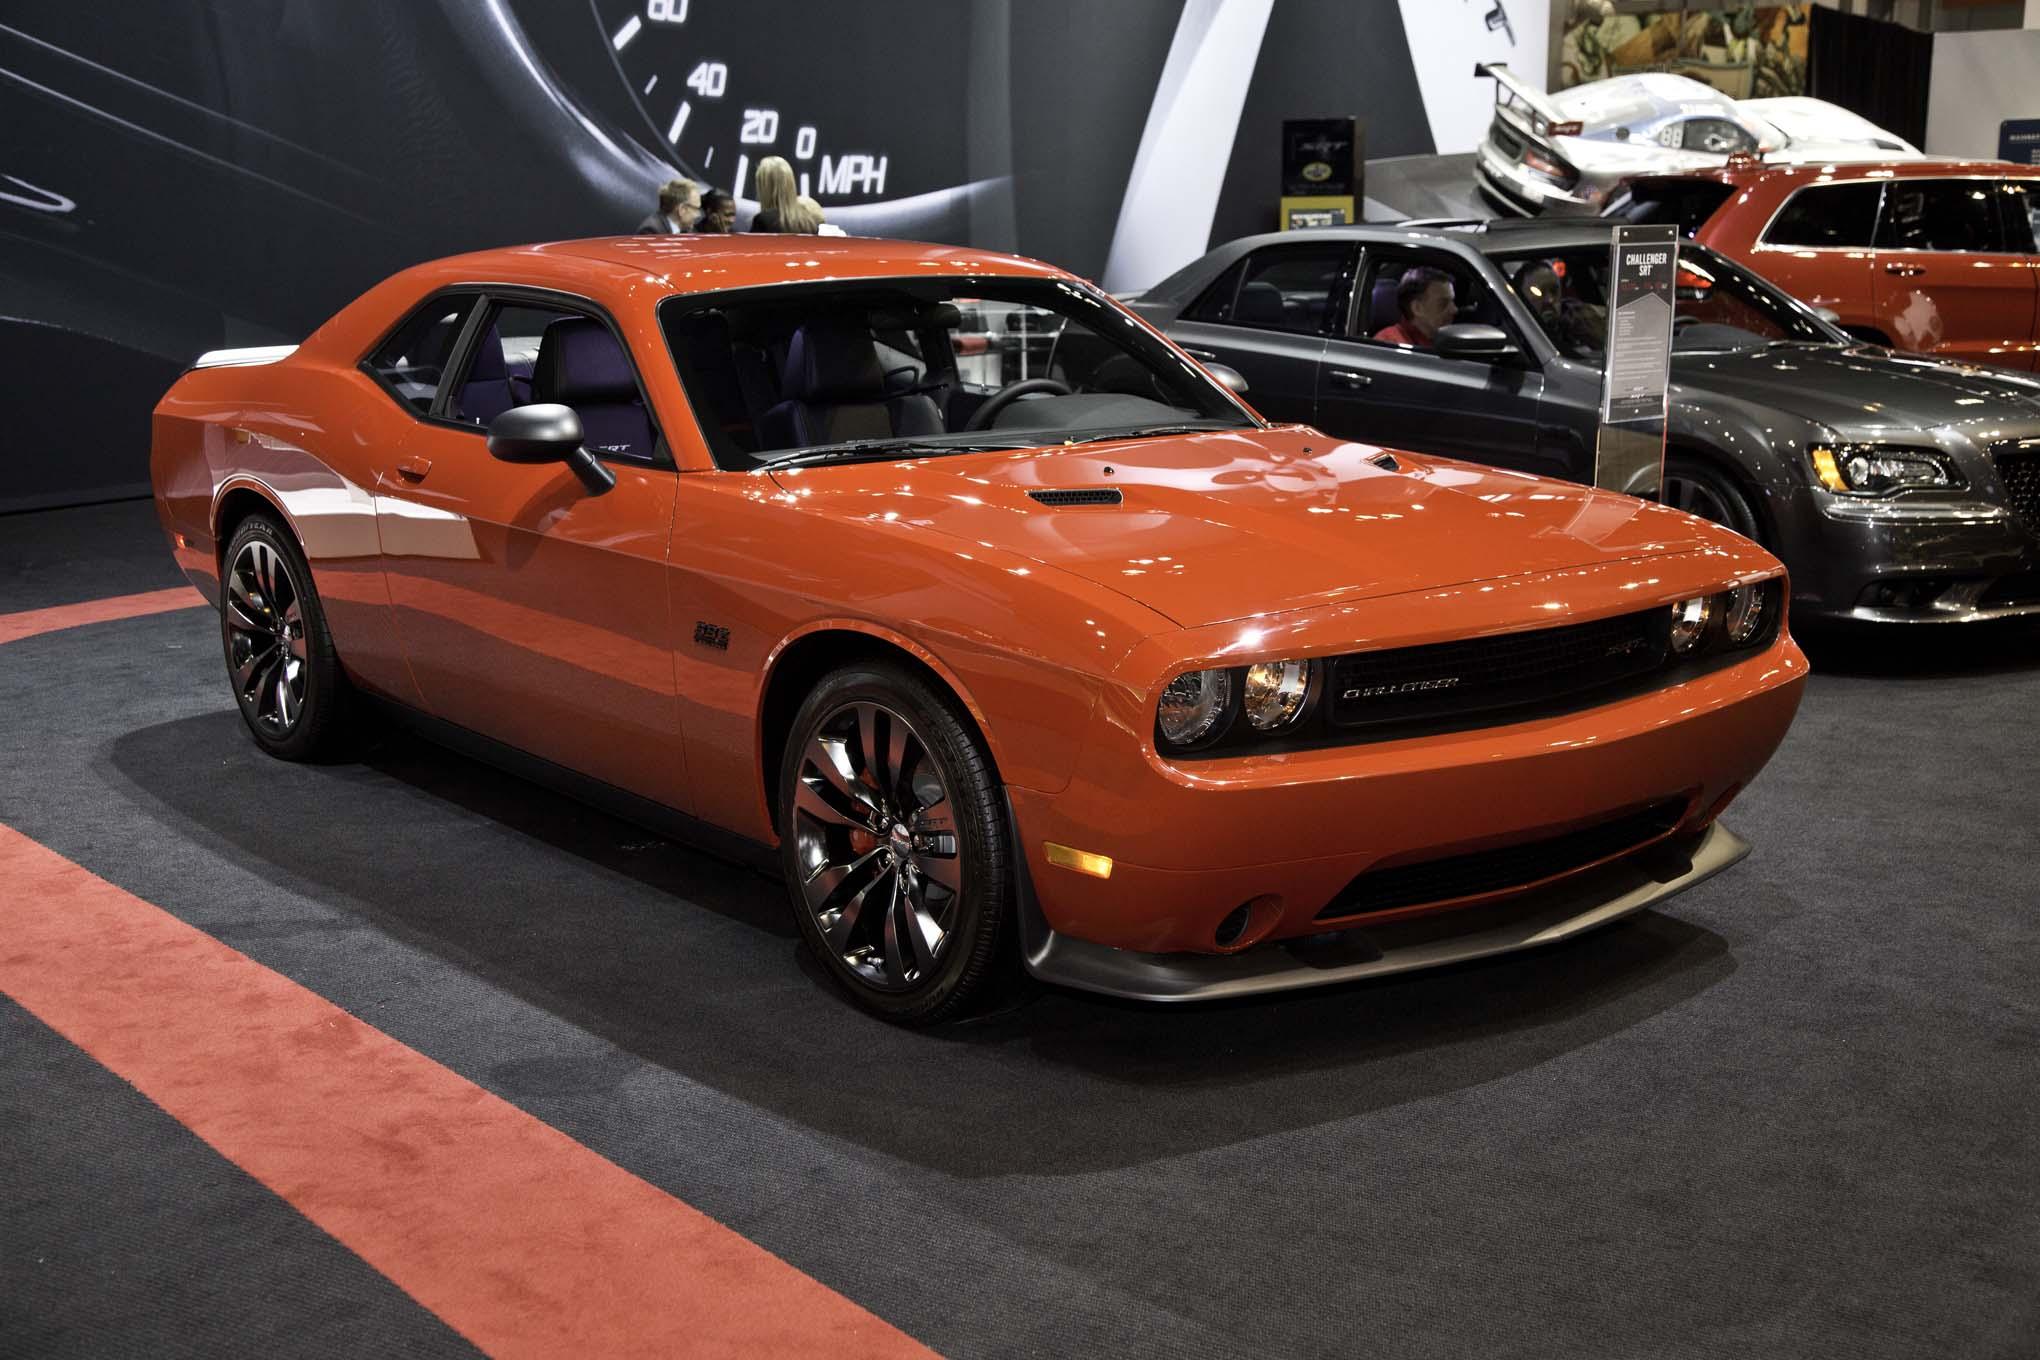 Dodge Challenger 2014 Un Bello Y Poderoso Muscle Car Lista De Carros